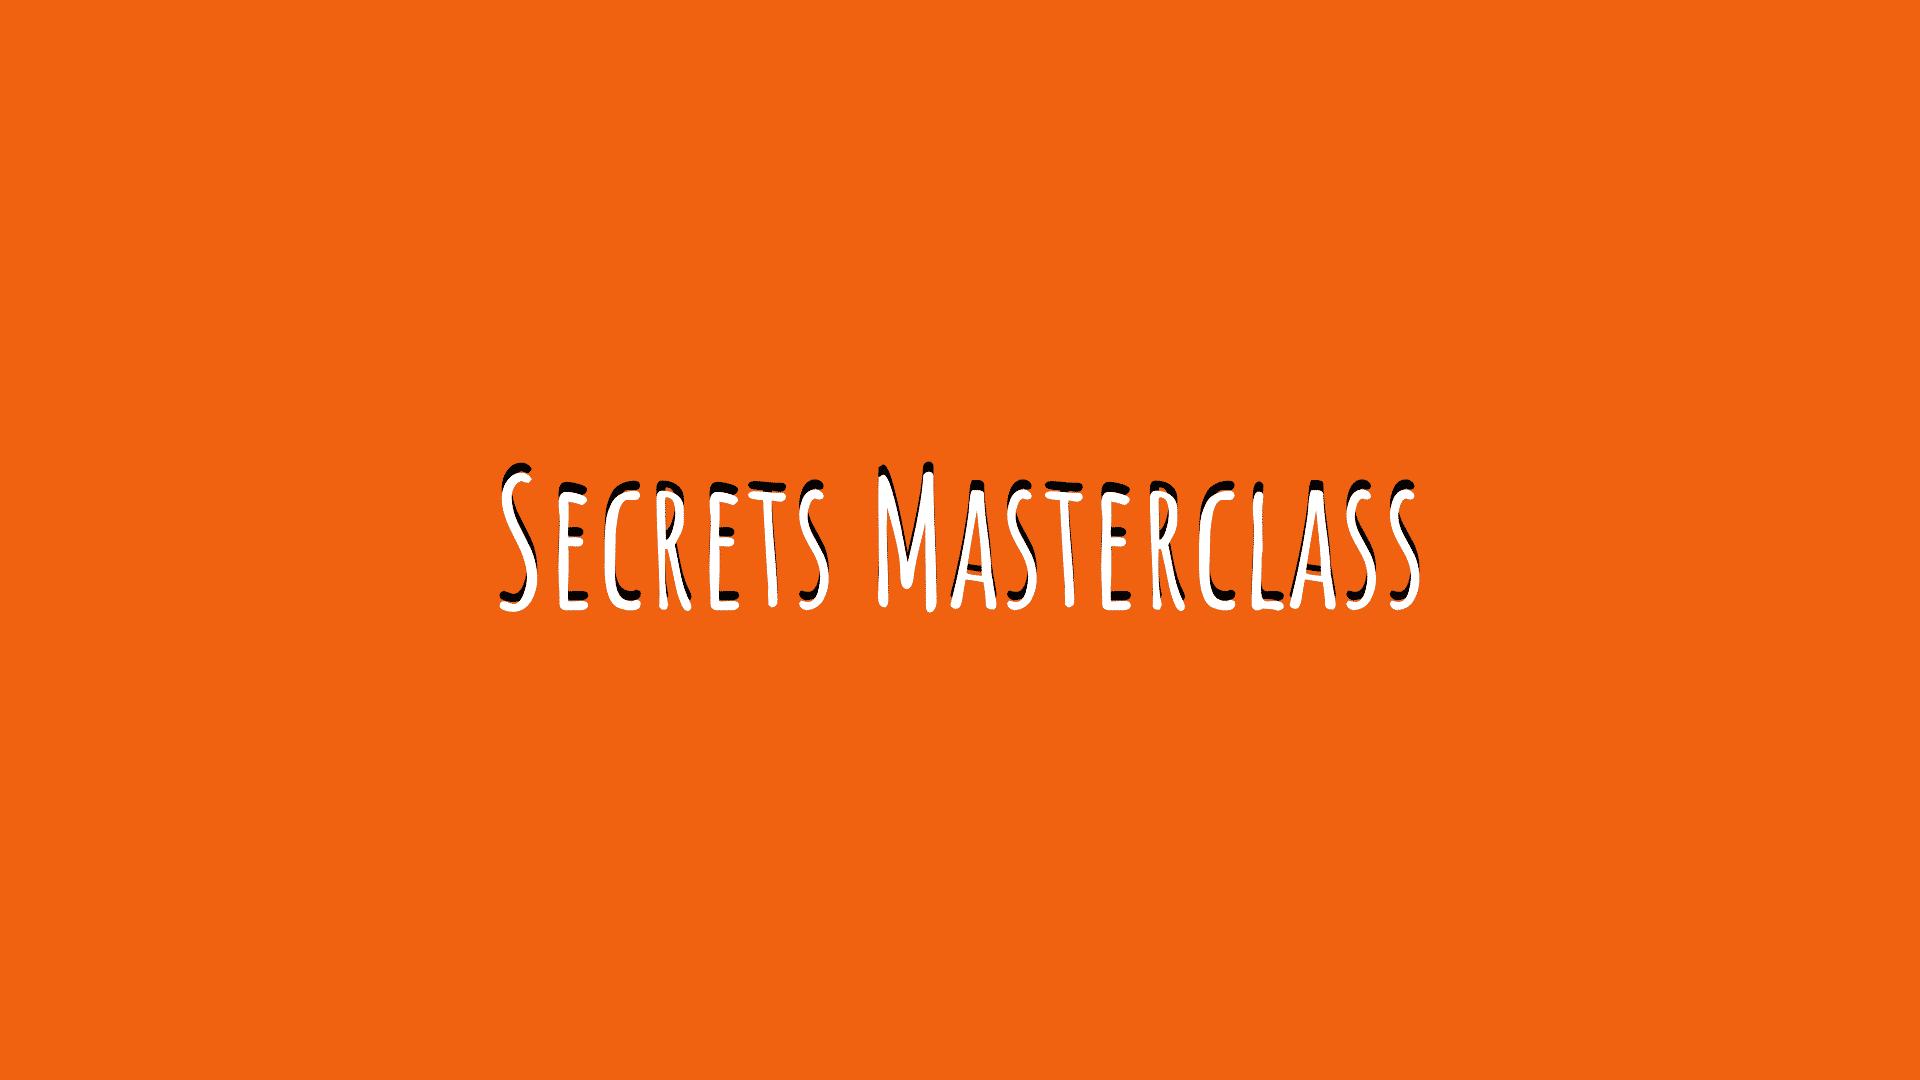 Secrets Masterclass